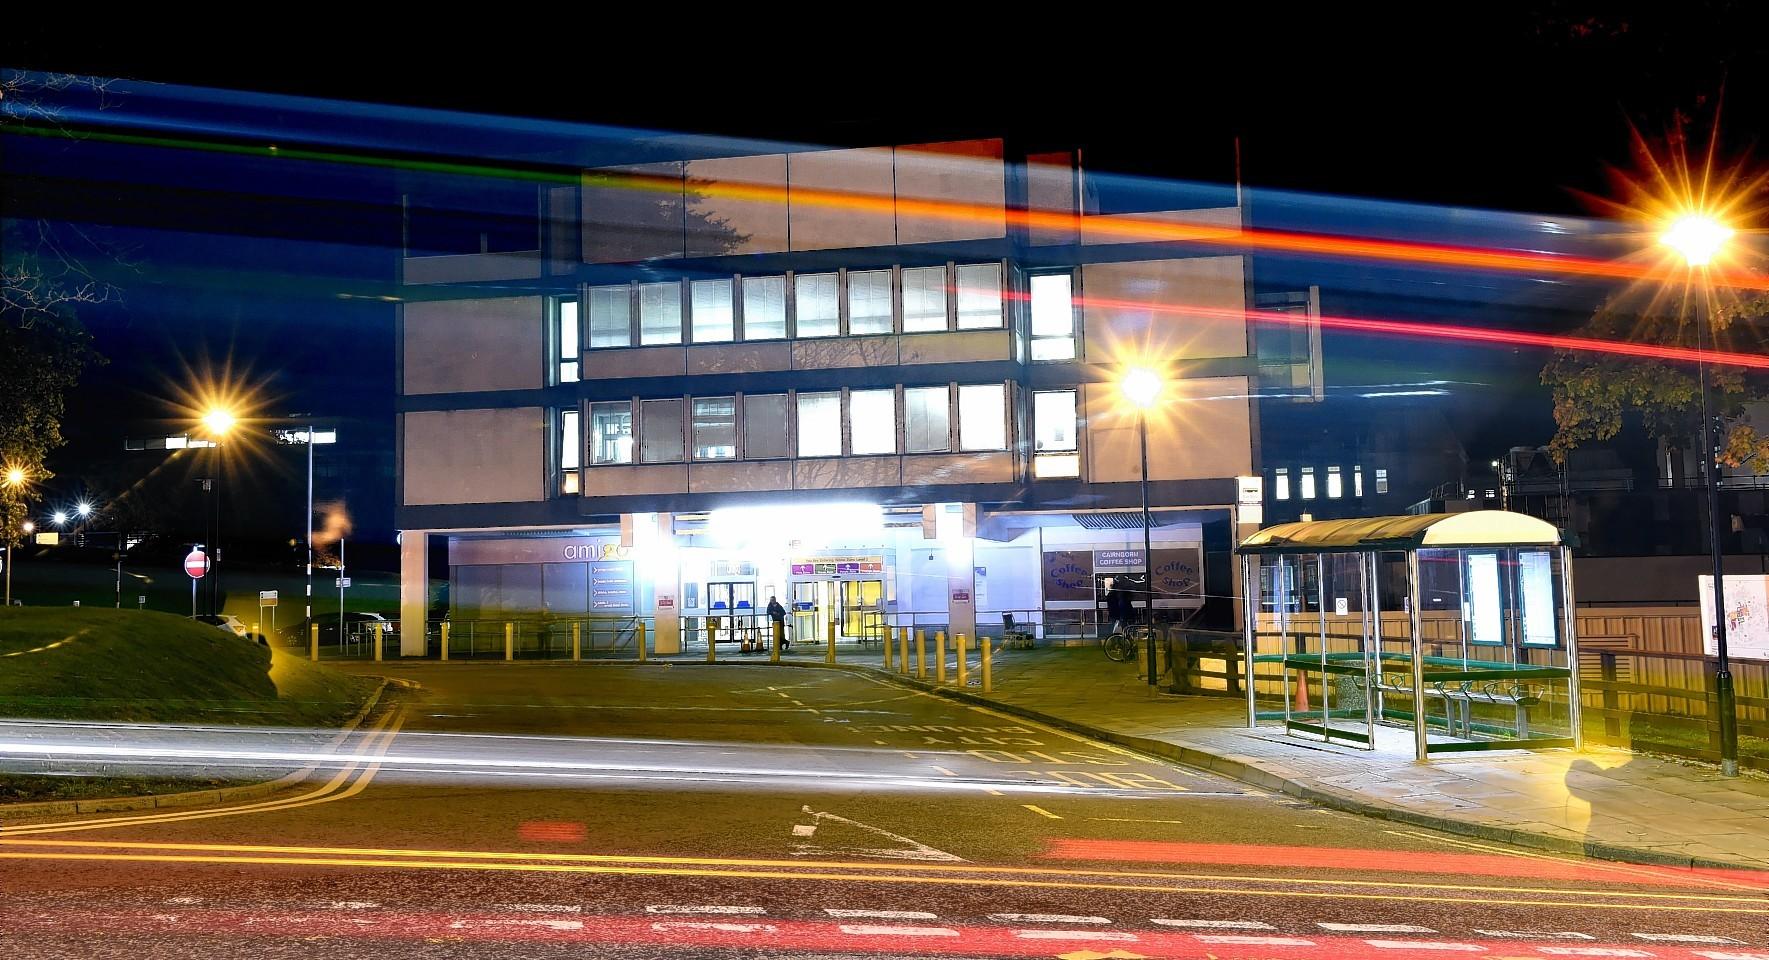 Aberdeen Royal Infirmary (ARI) at night.